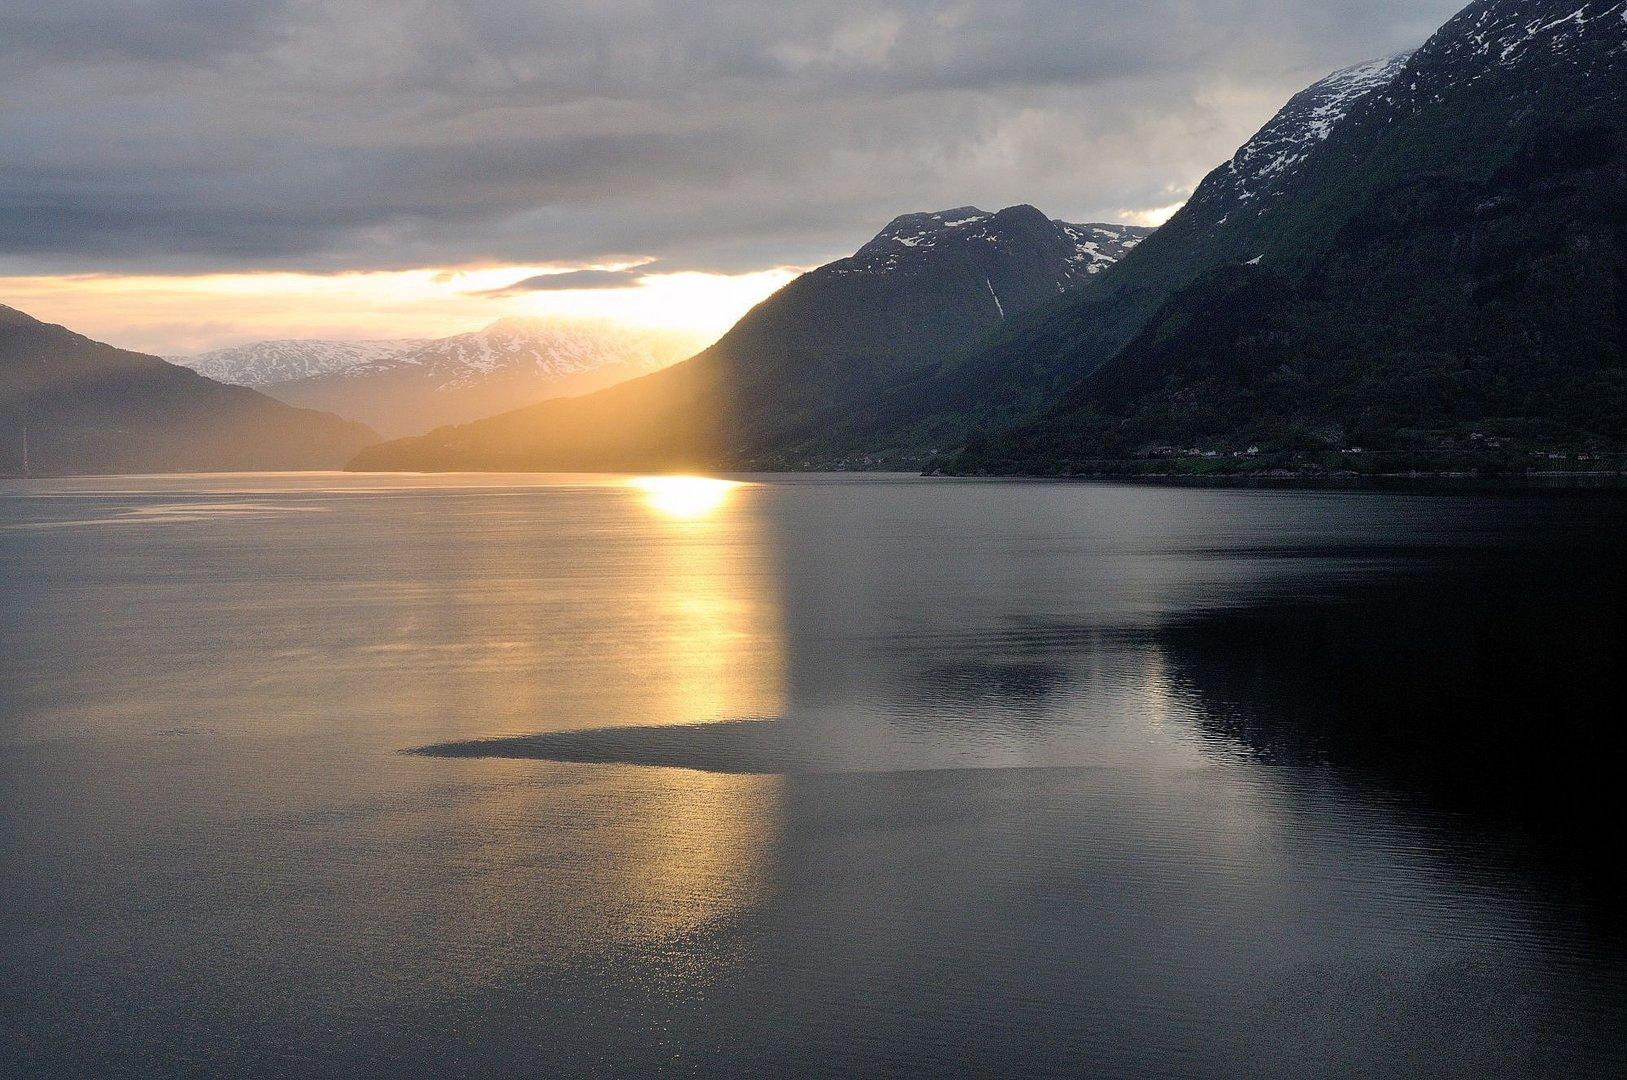 Sonnenaufgang an Deck der AIDA-Luna - Hardangerfjord Norwegen-